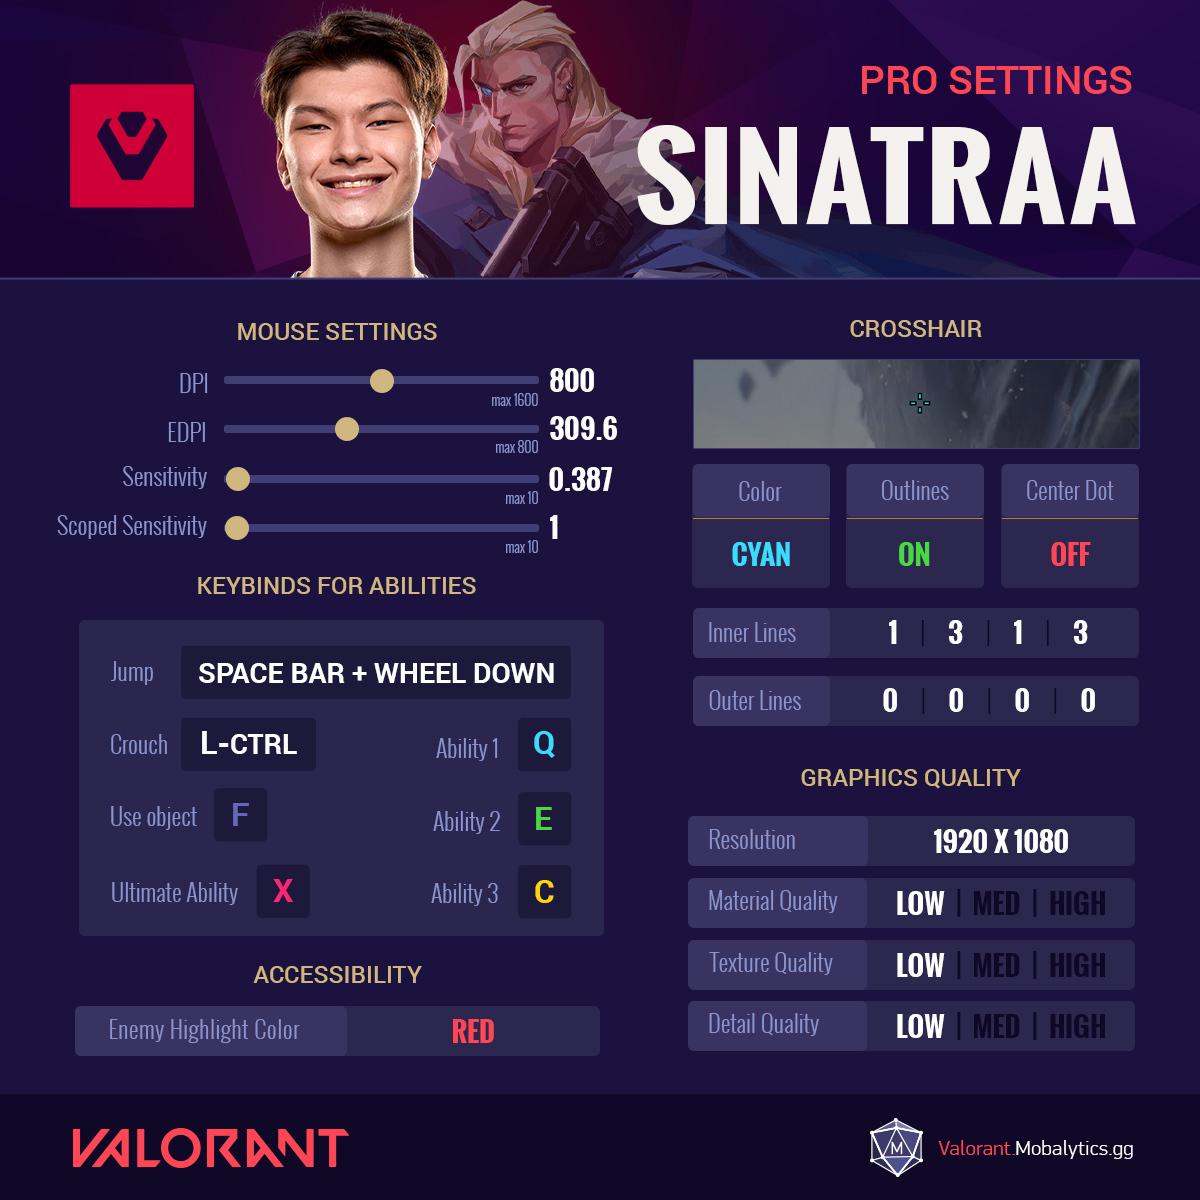 Sinatraa Valorant Pro Settings